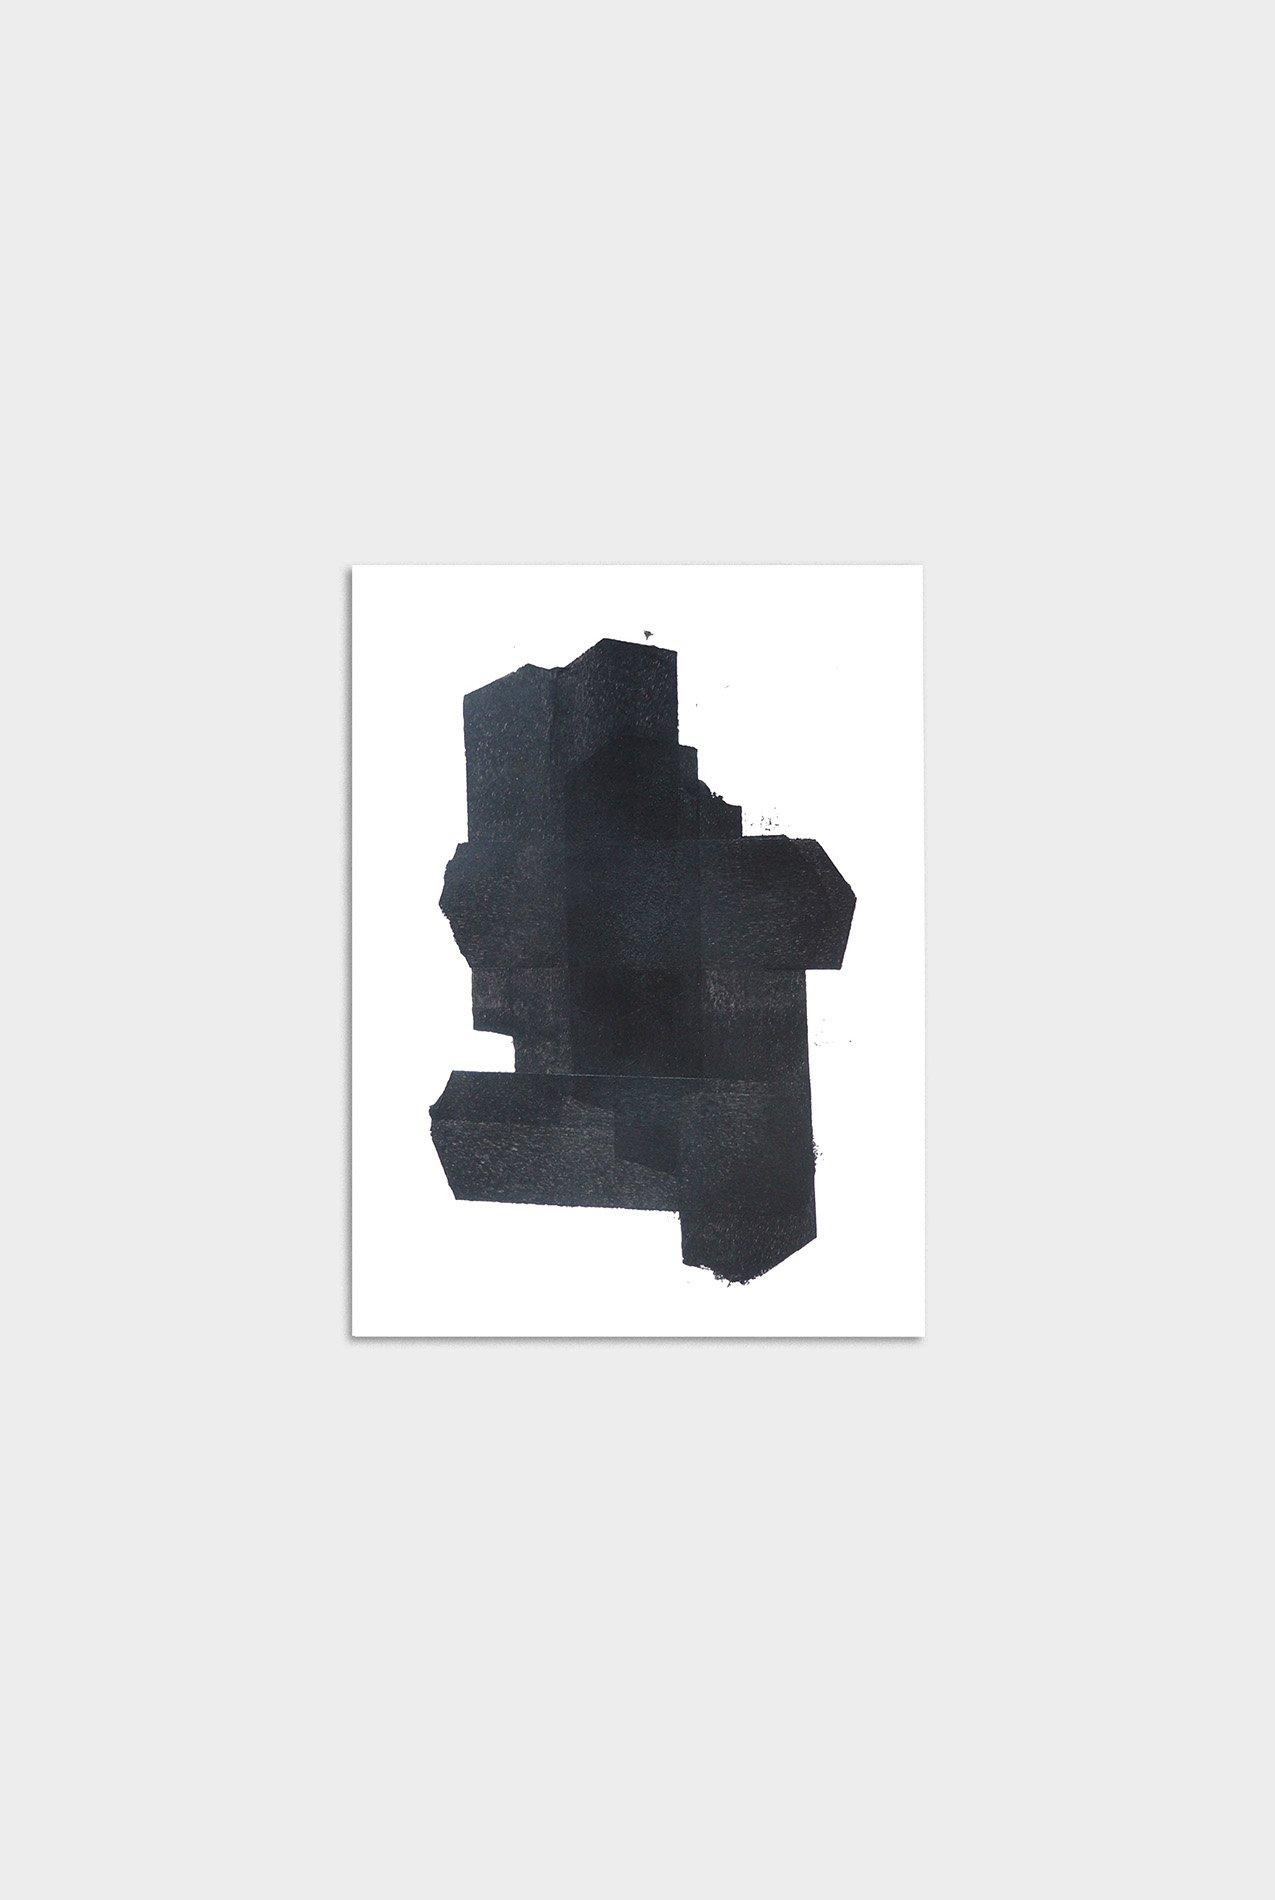 POSE /2 - Artwork - 42x29,7cm - Limited edition